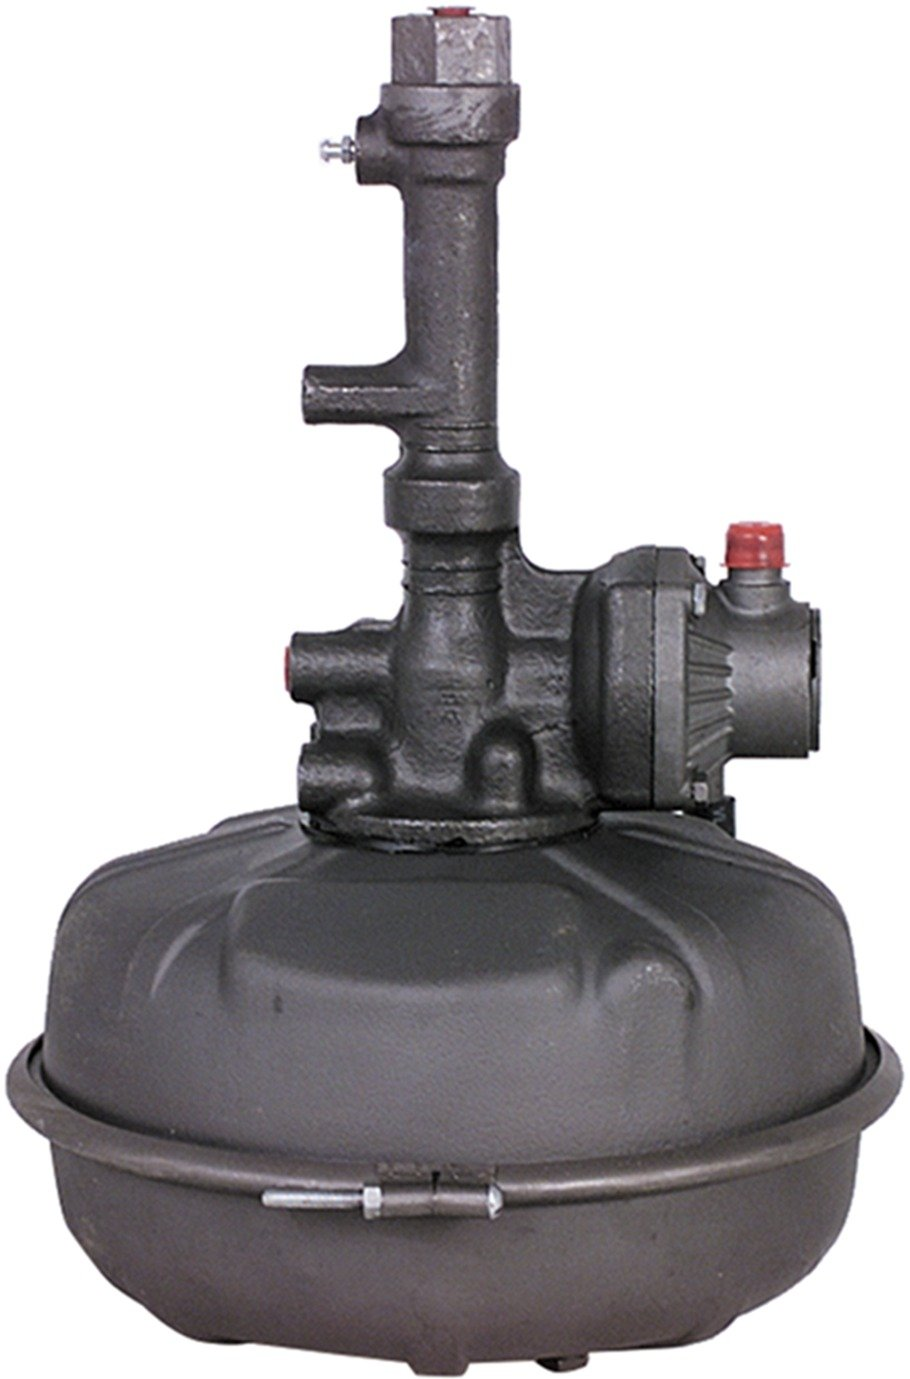 Cardone 51-8003 Remanufactured Hydrovac Booster by A1 Cardone